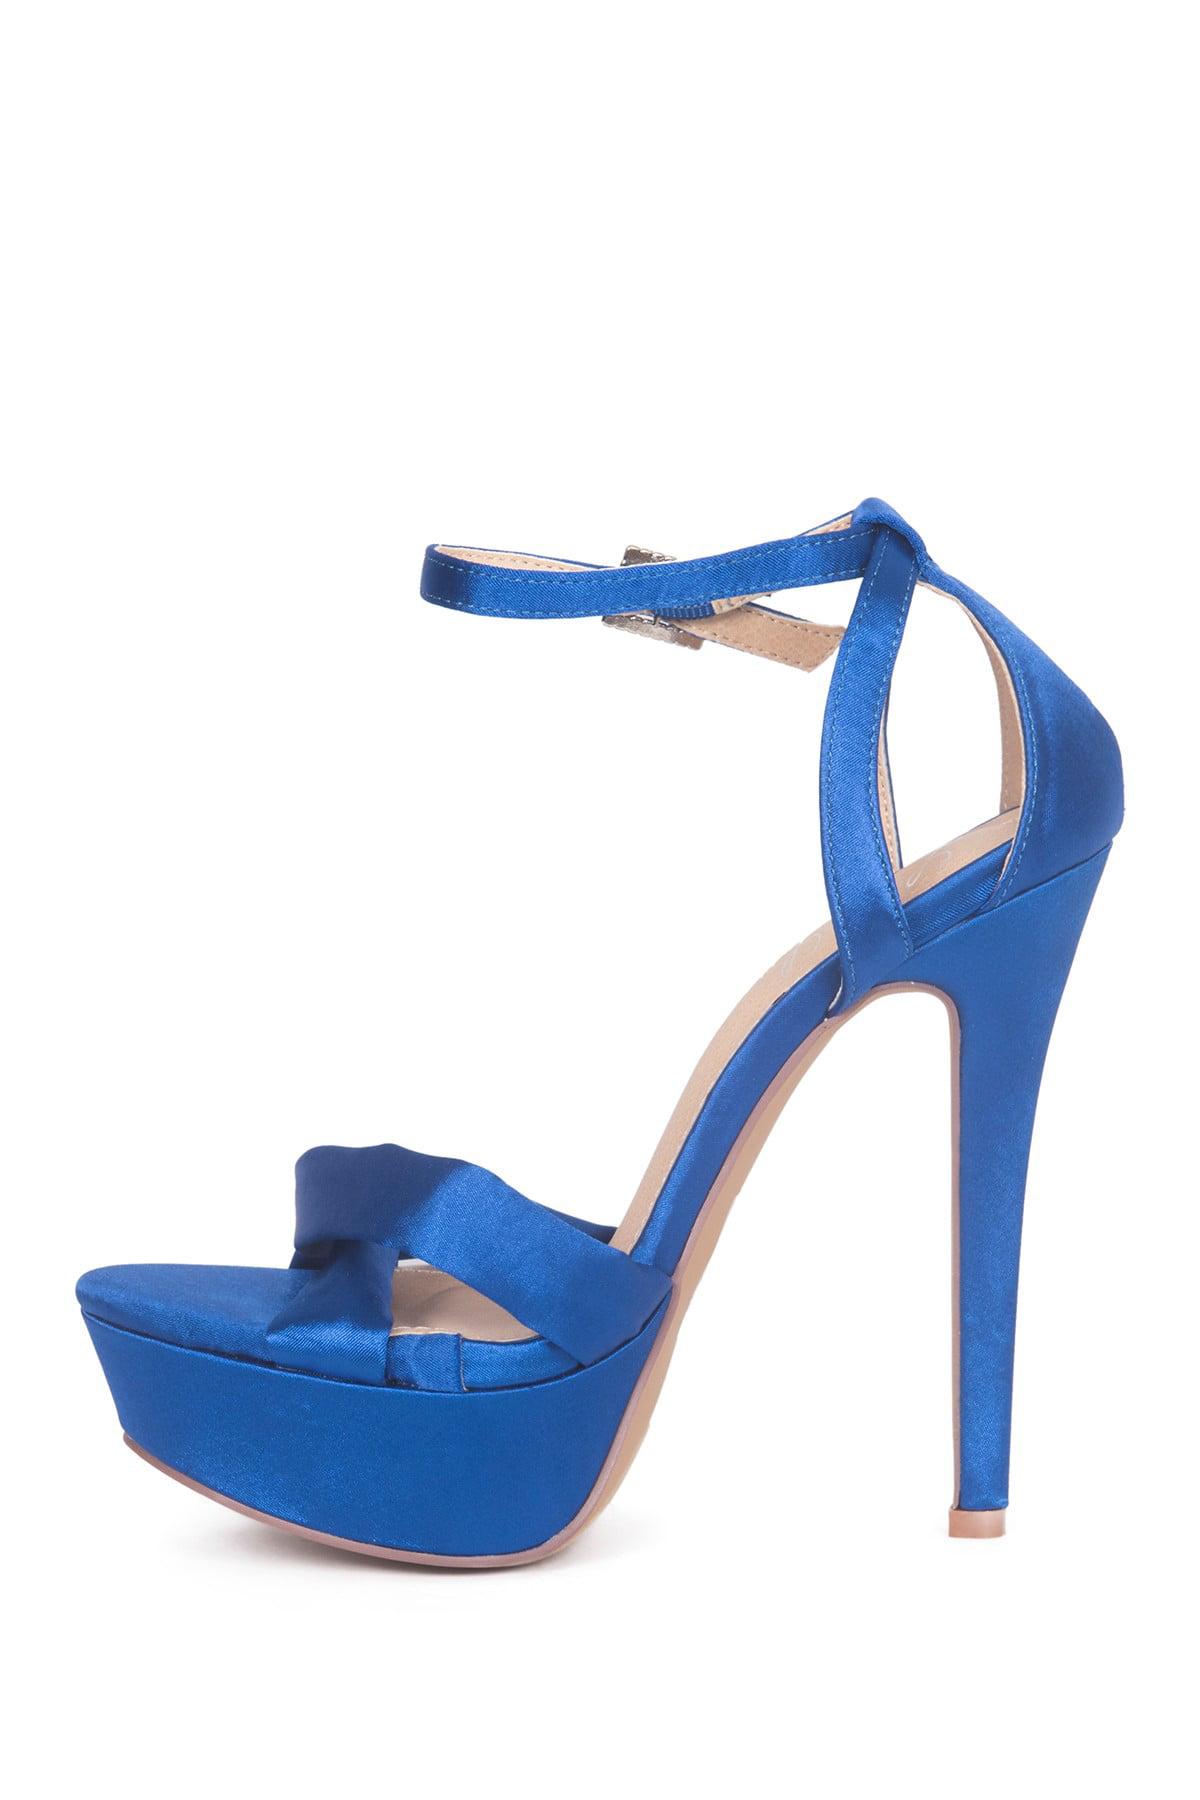 Lauren Lorraine Royal Blue Heidi Platform Special Occasion Sandal Royal Blue